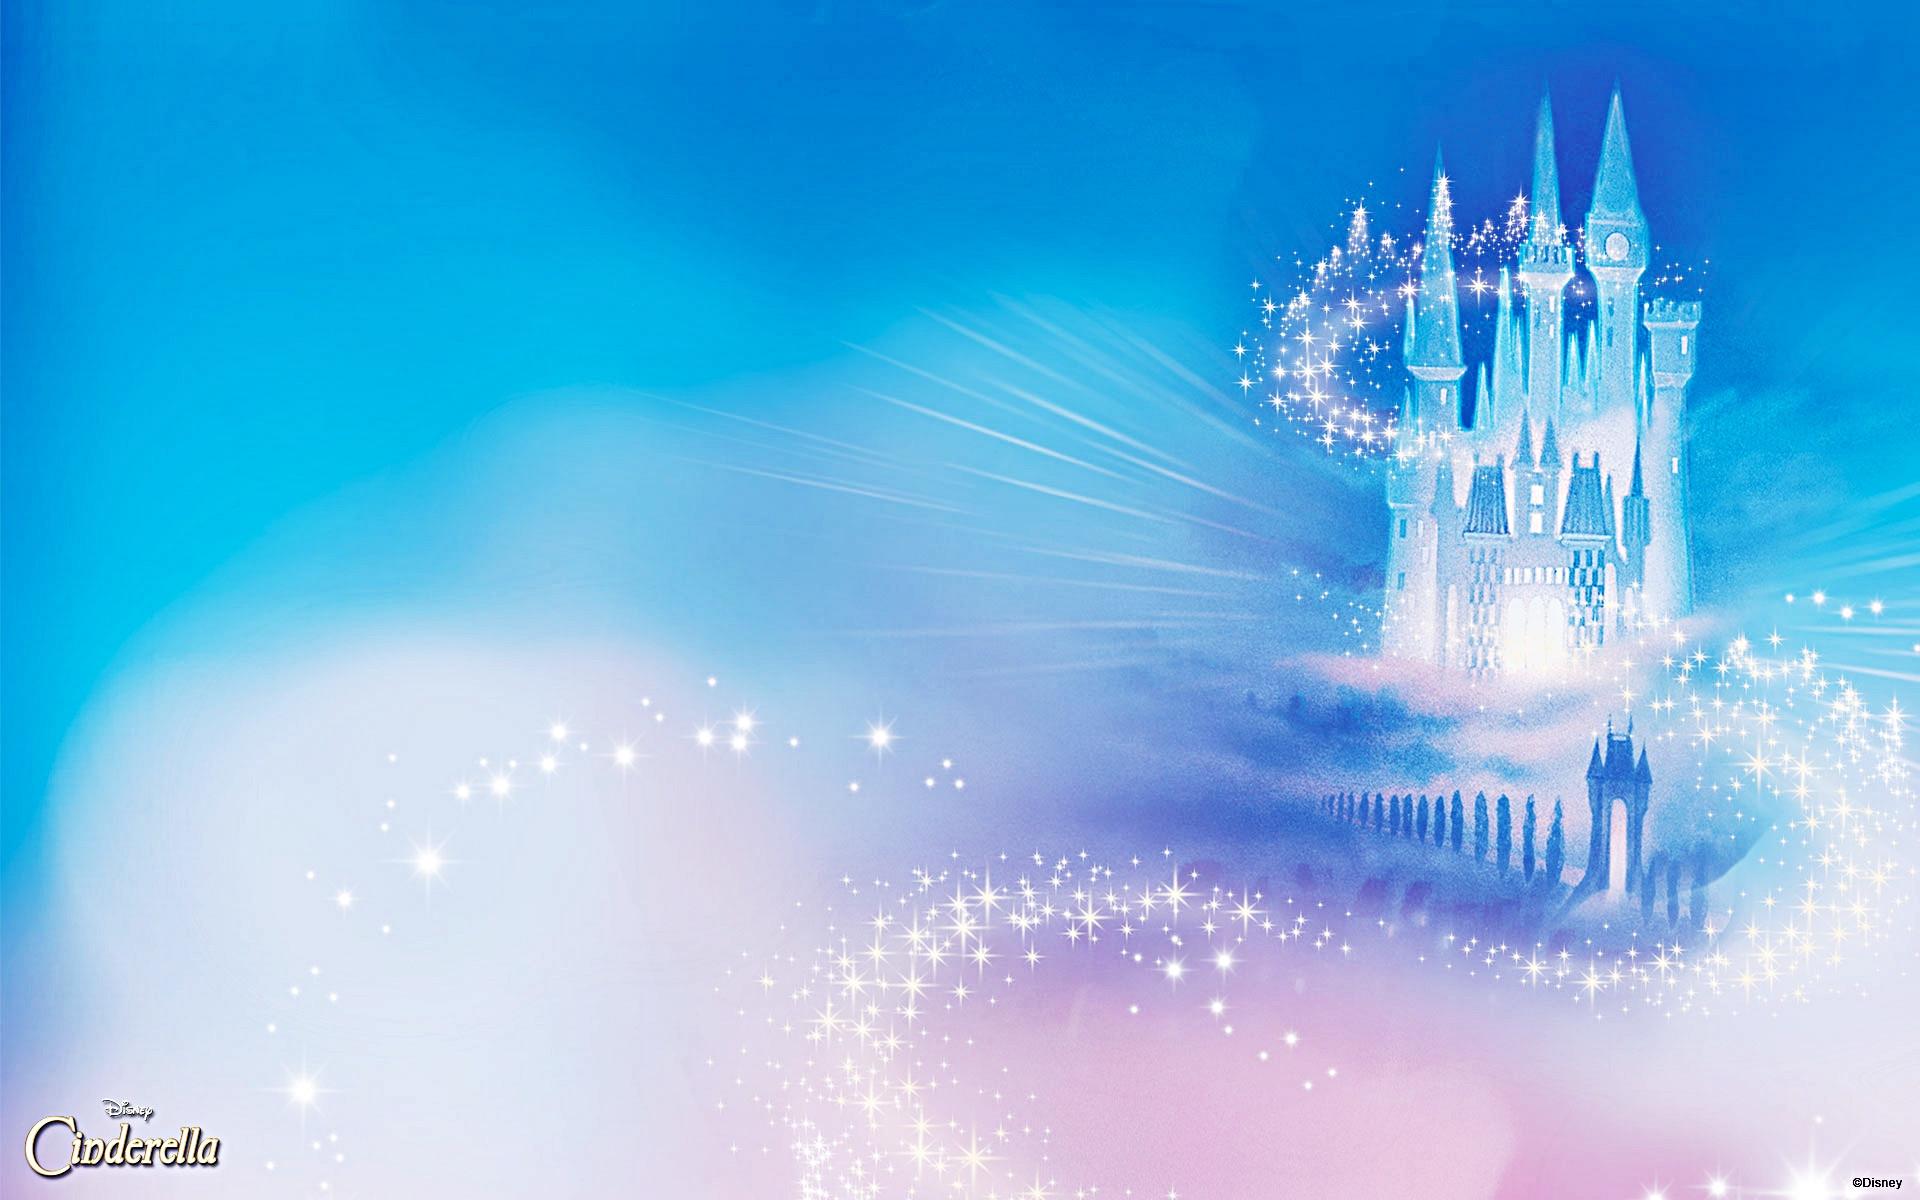 50 Cinderella Wallpapers For Desktop On Wallpapersafari